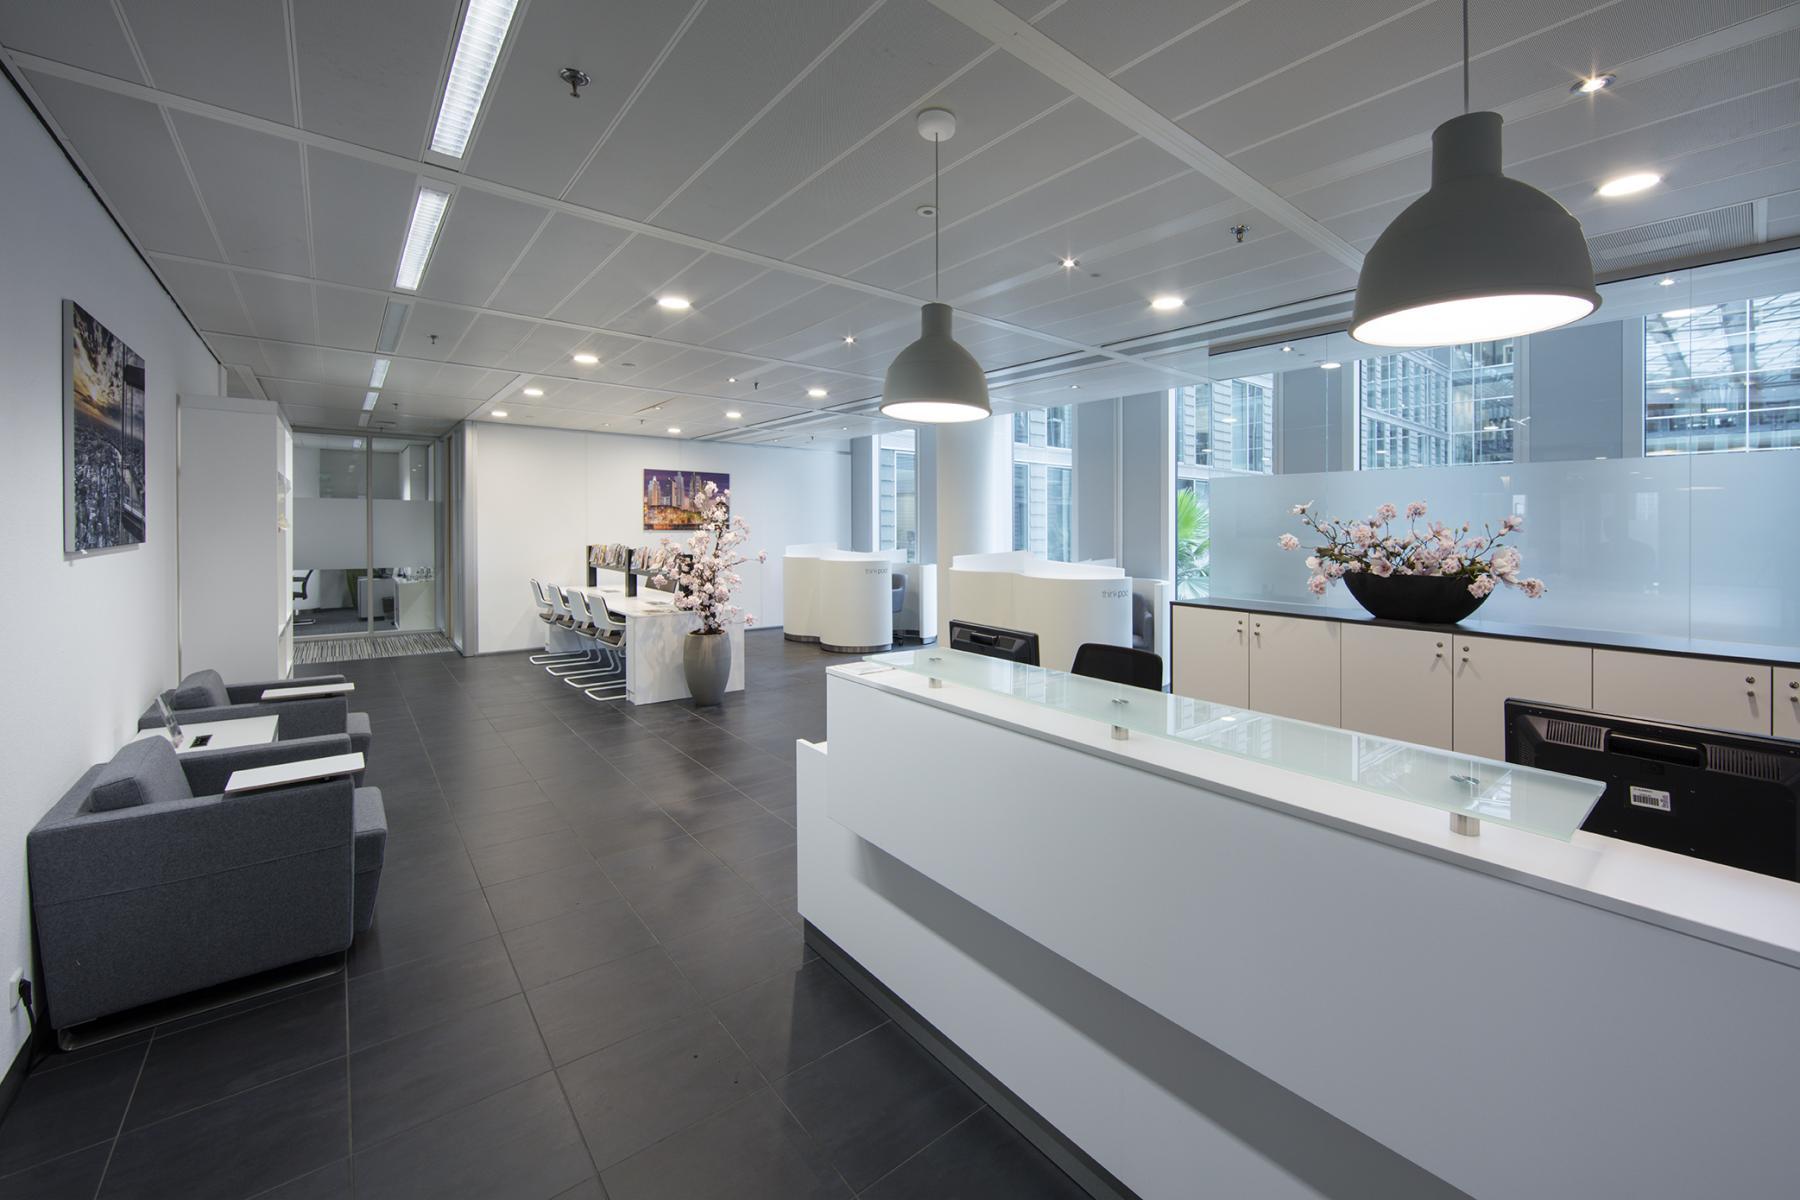 receptiebalie loungestoelen lunchtafel kantoorpand wtc amsterdam zuidas lampen ramen uitzicht